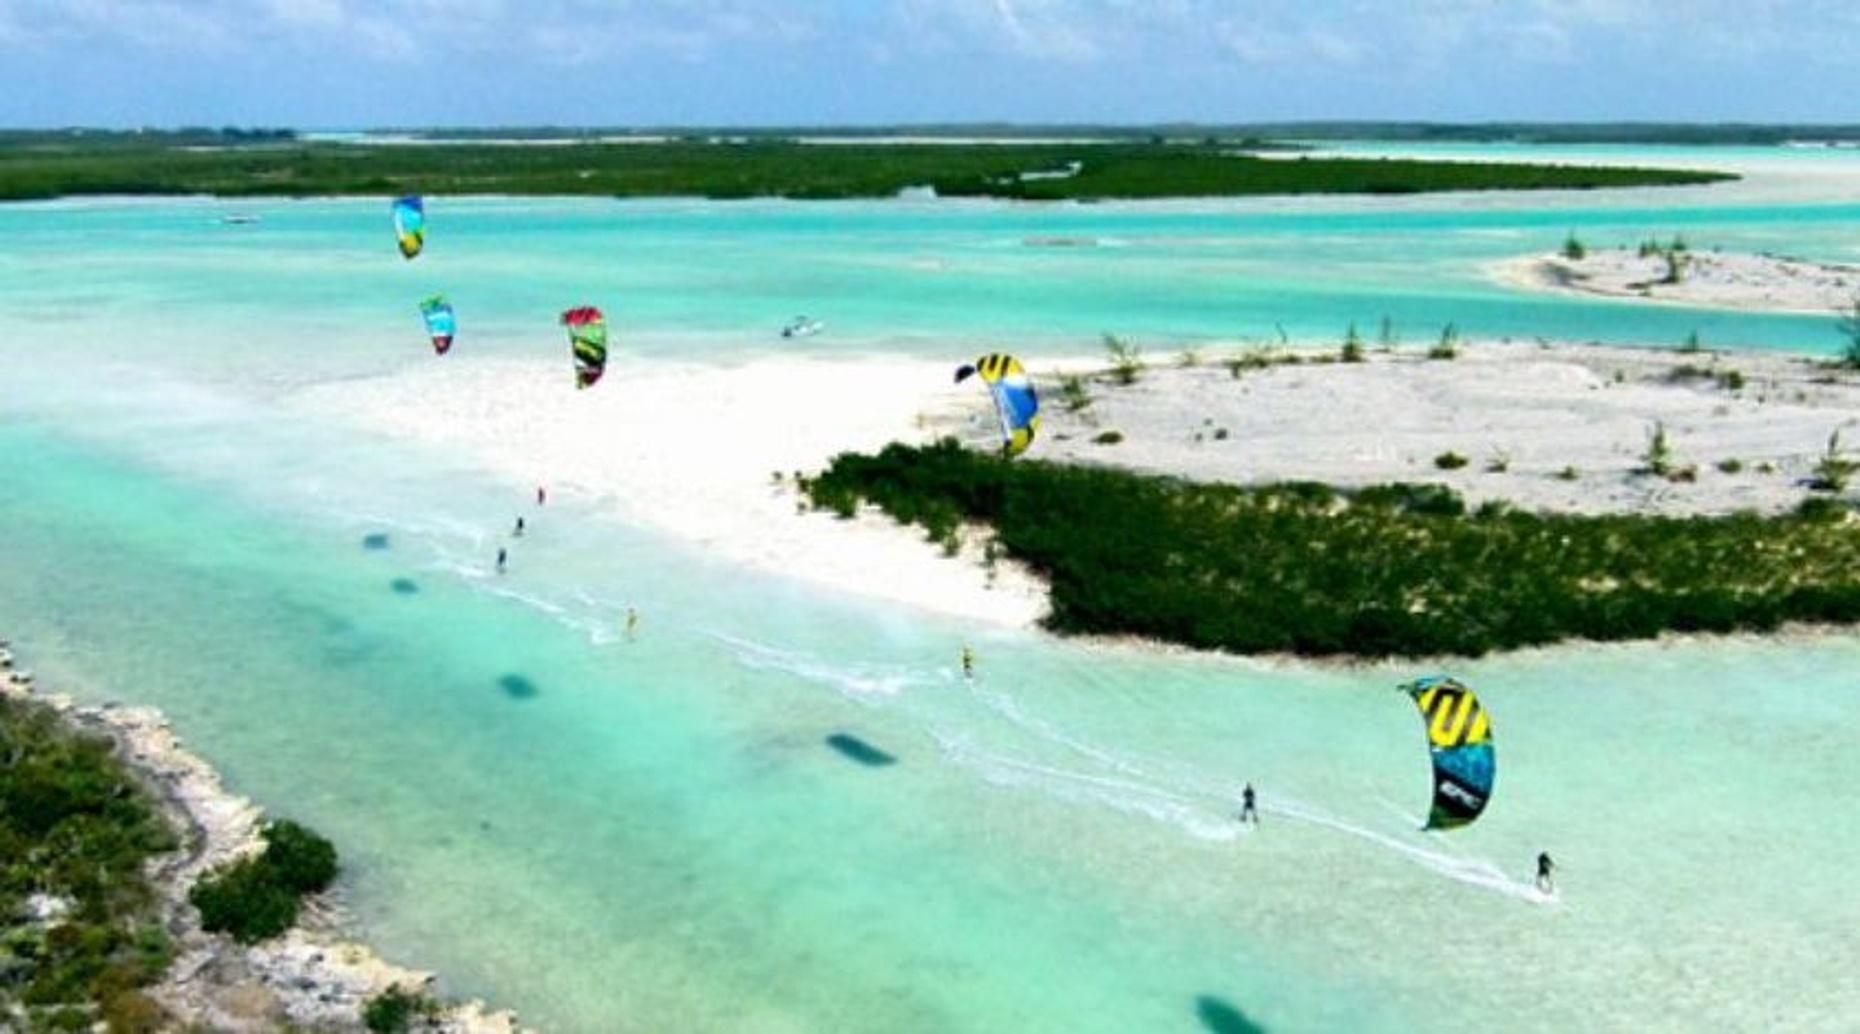 Kiteboarding Adventure on Turks and Caicos Island